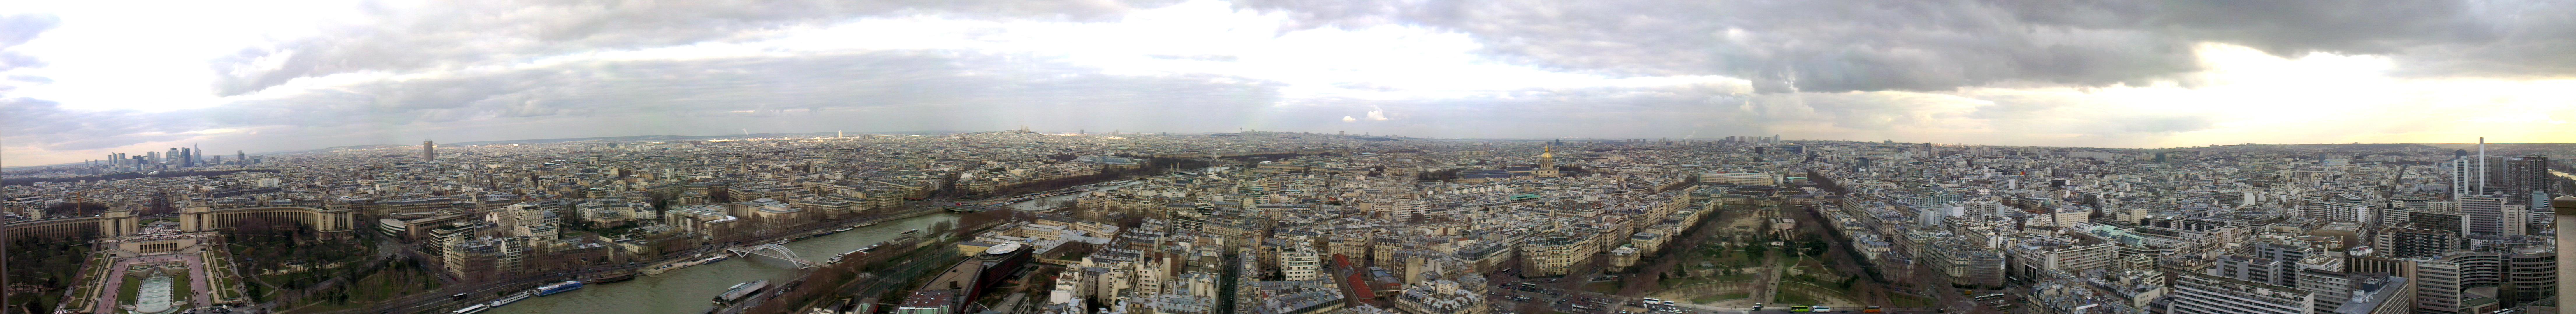 ParisFromTheTower